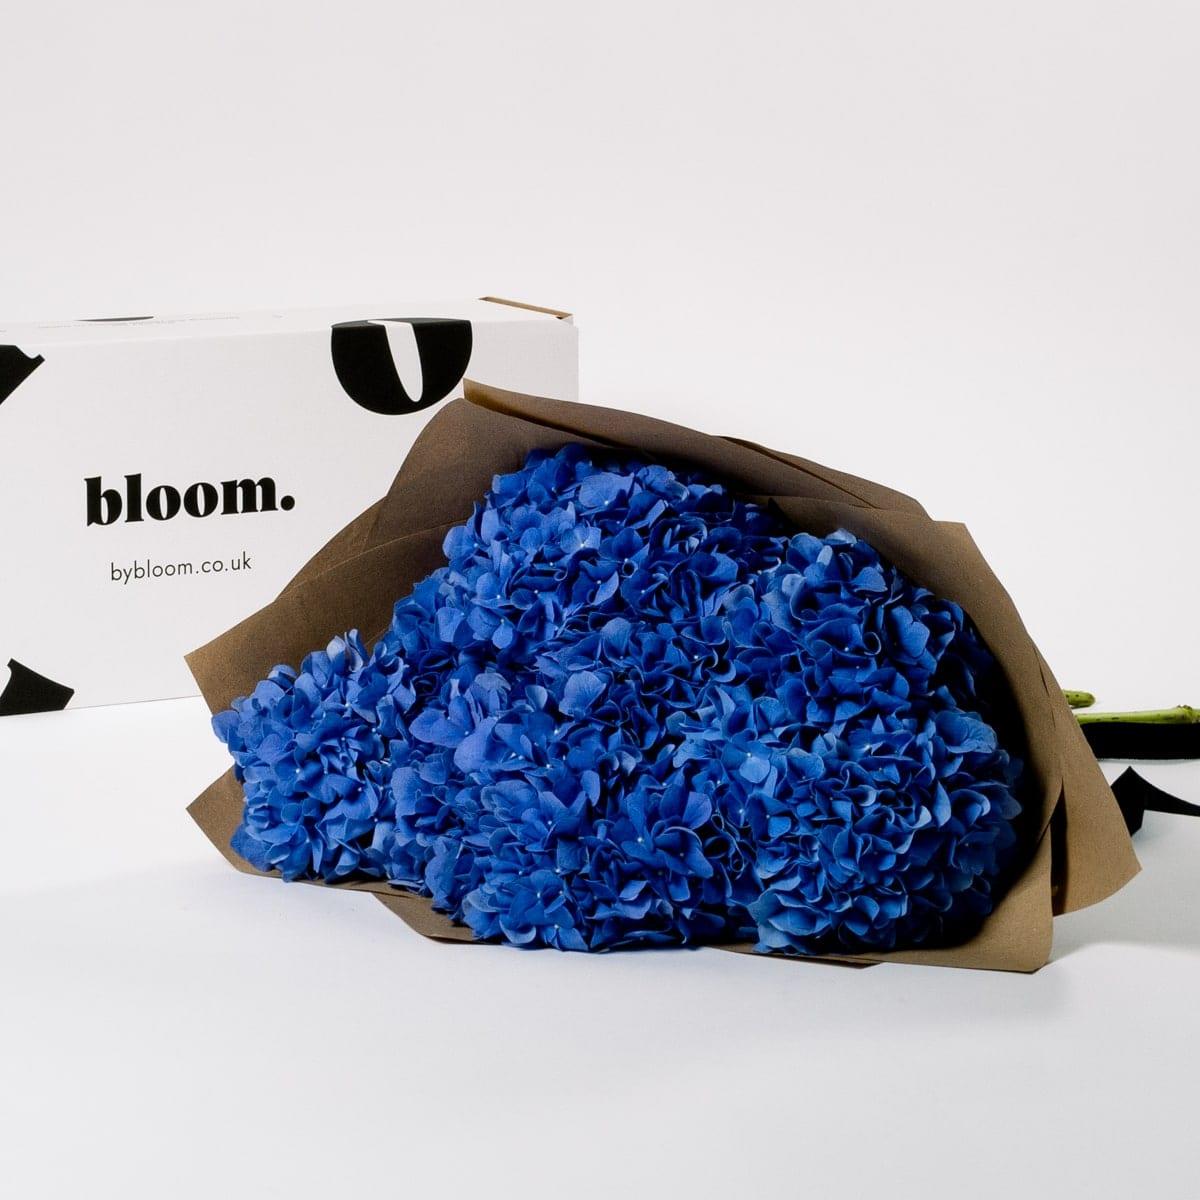 Bloom Flower Delivery | Ultra Marine Blue Hydrangea